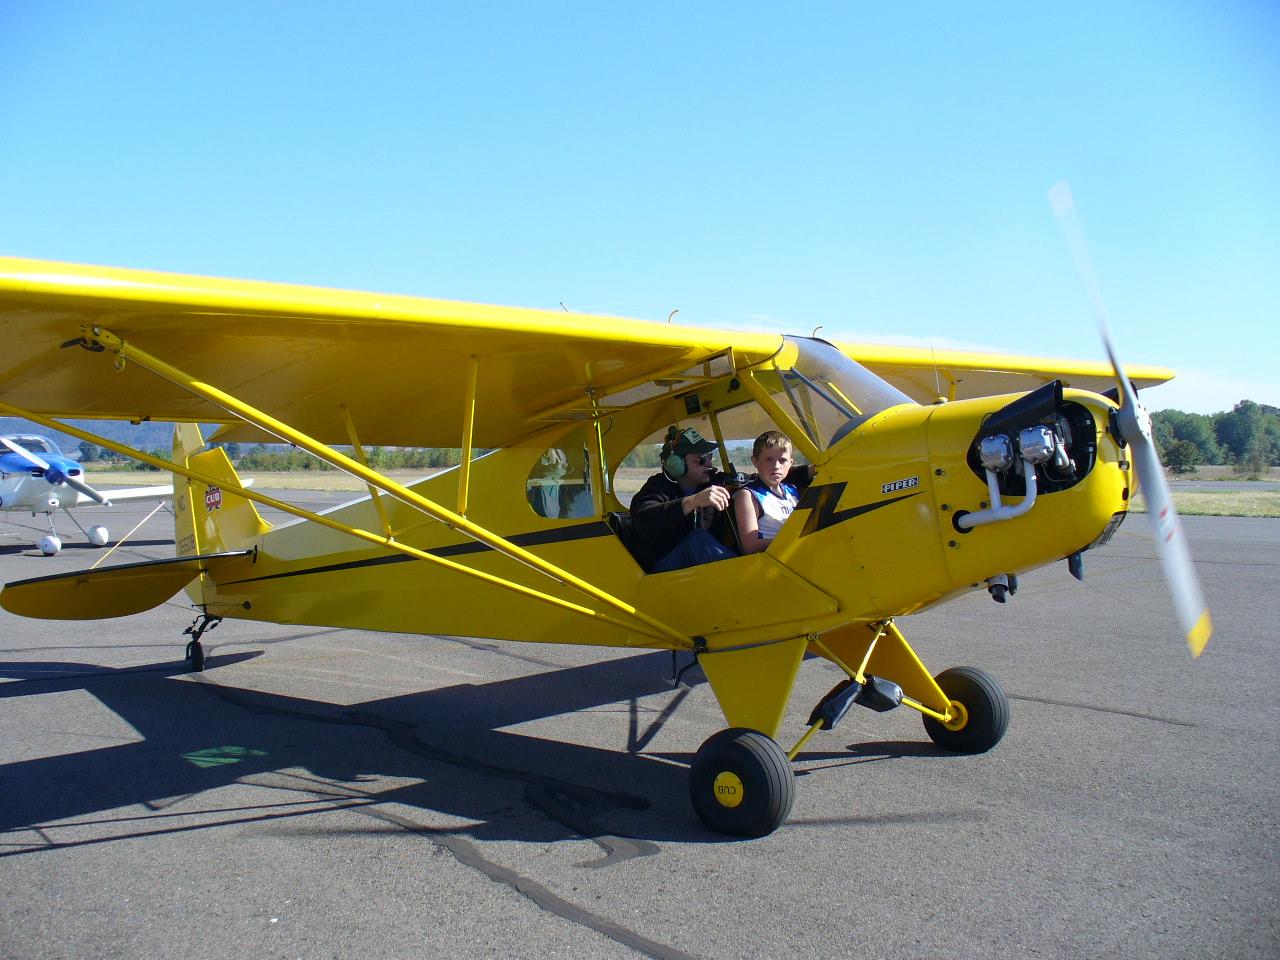 P1000210.JPG